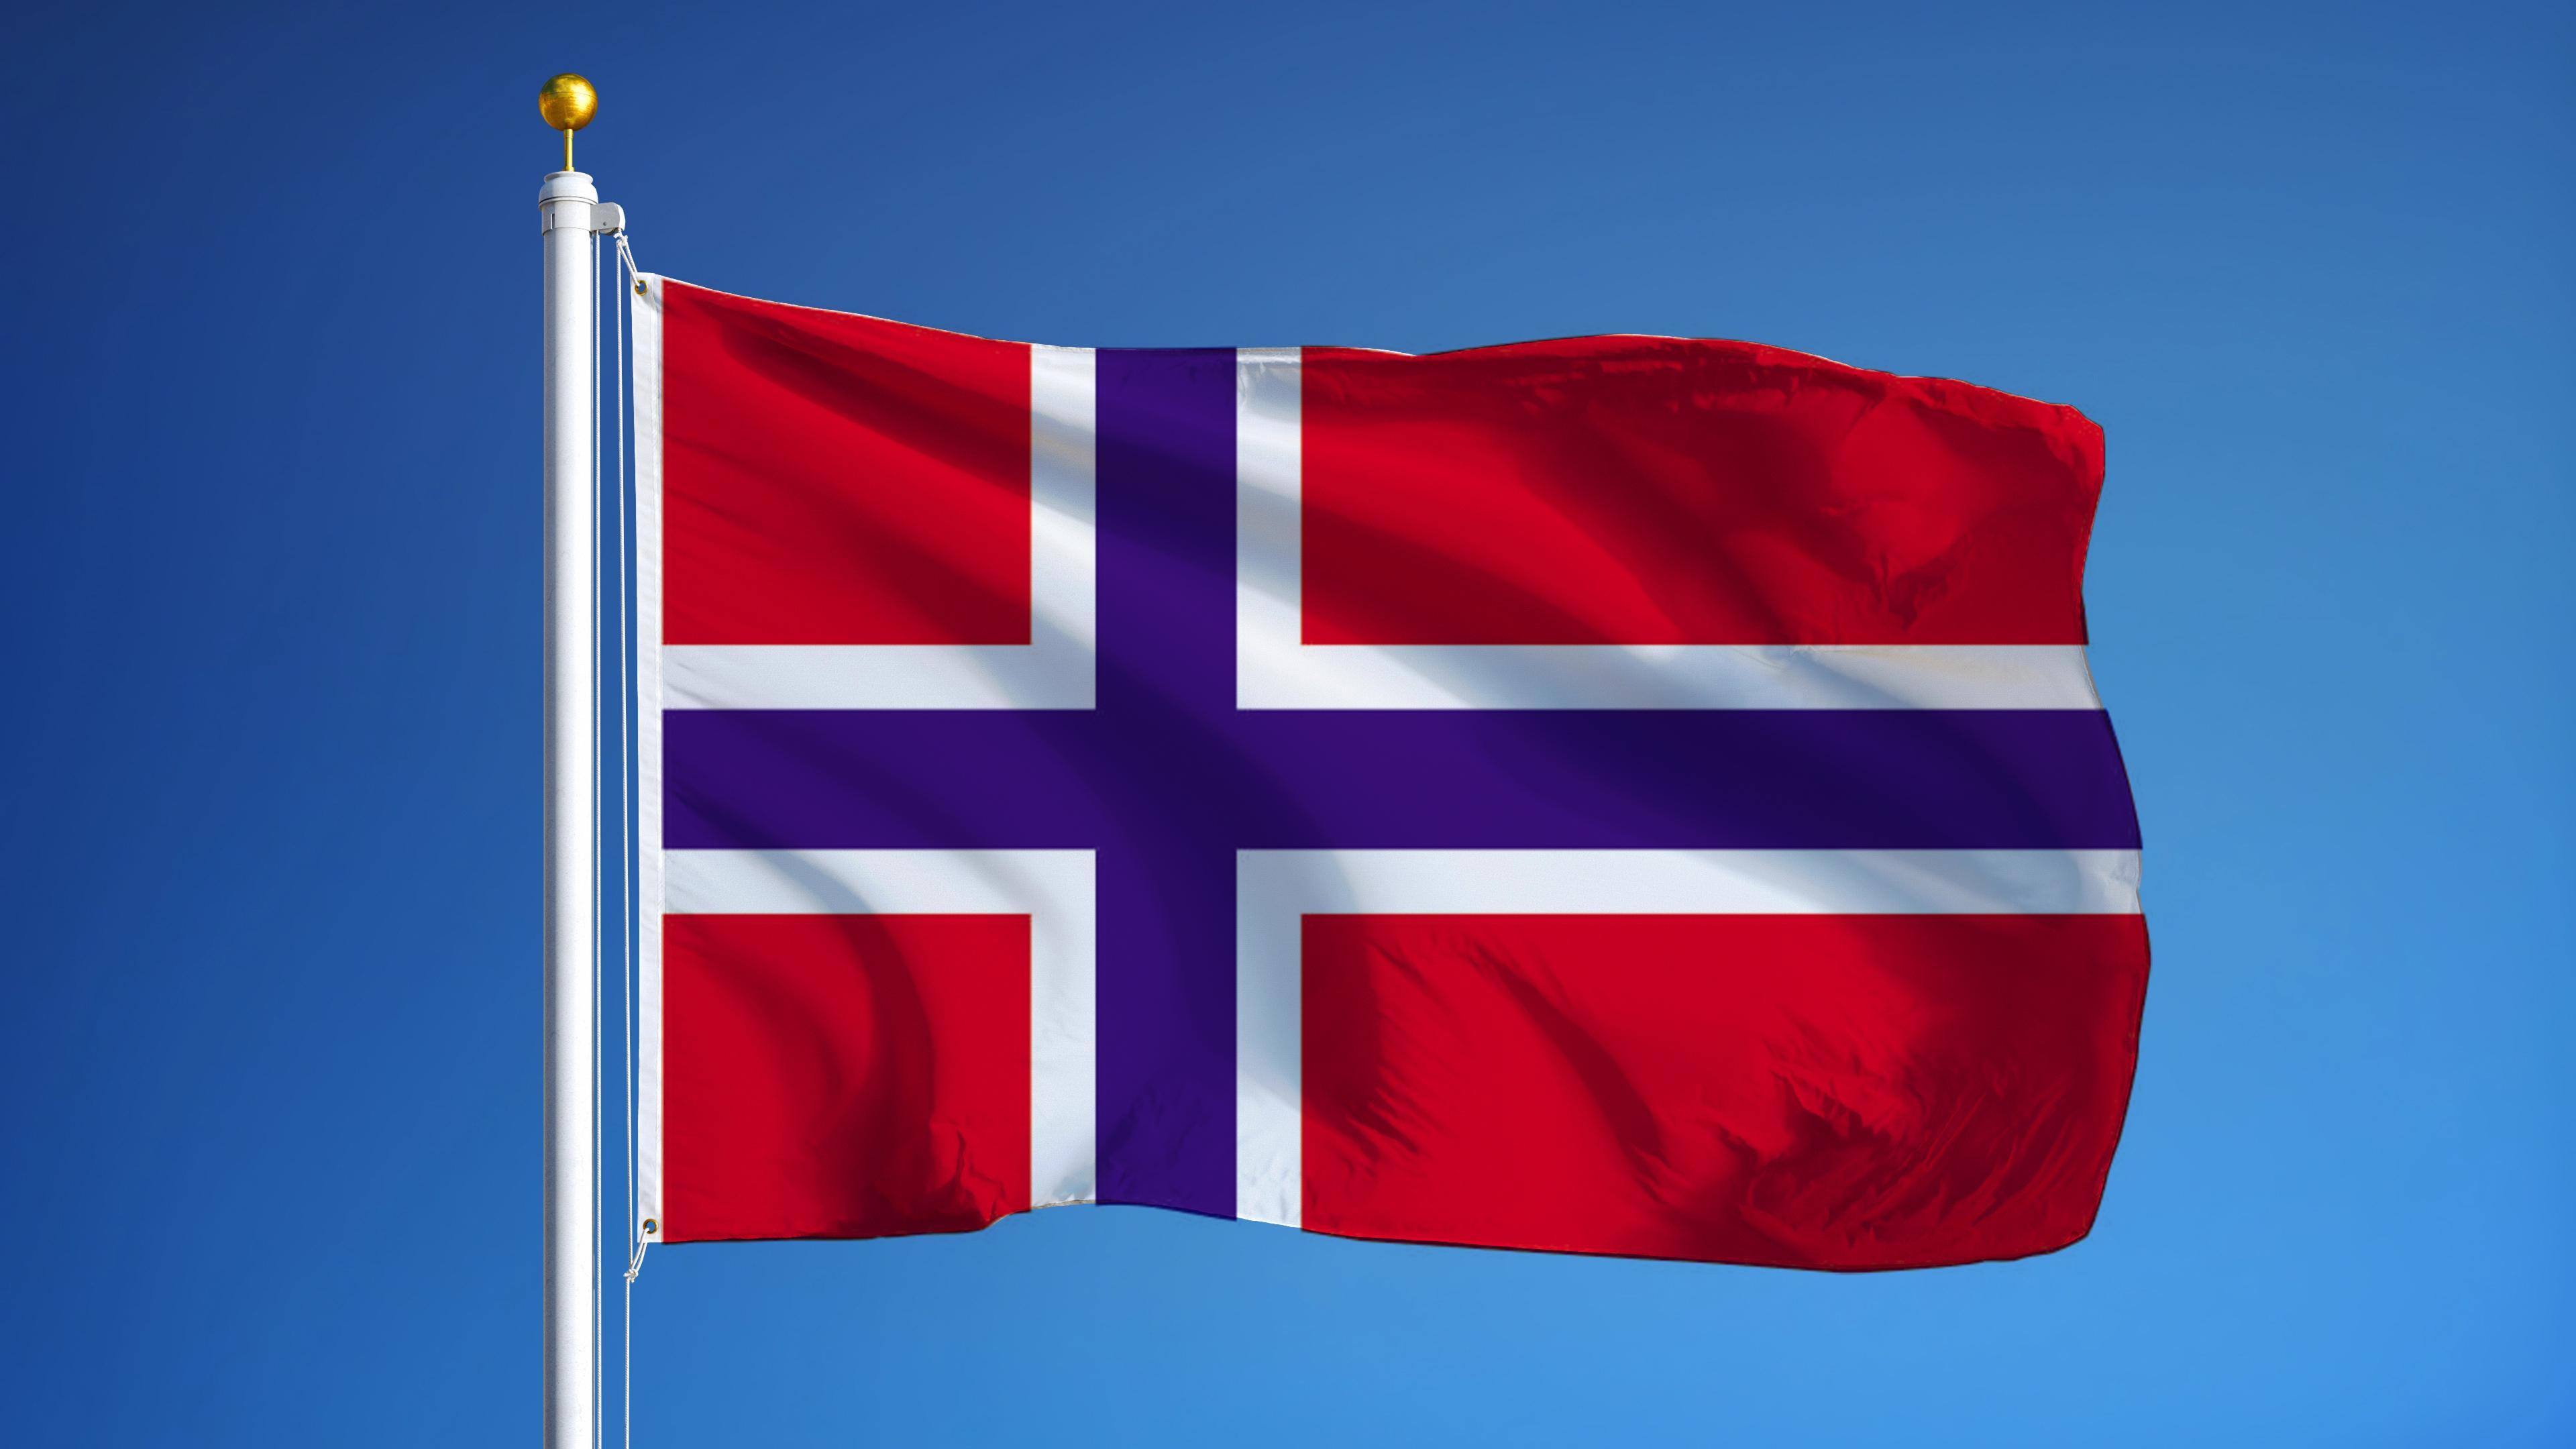 Флаг норвегии эдми картинки, святого валентина